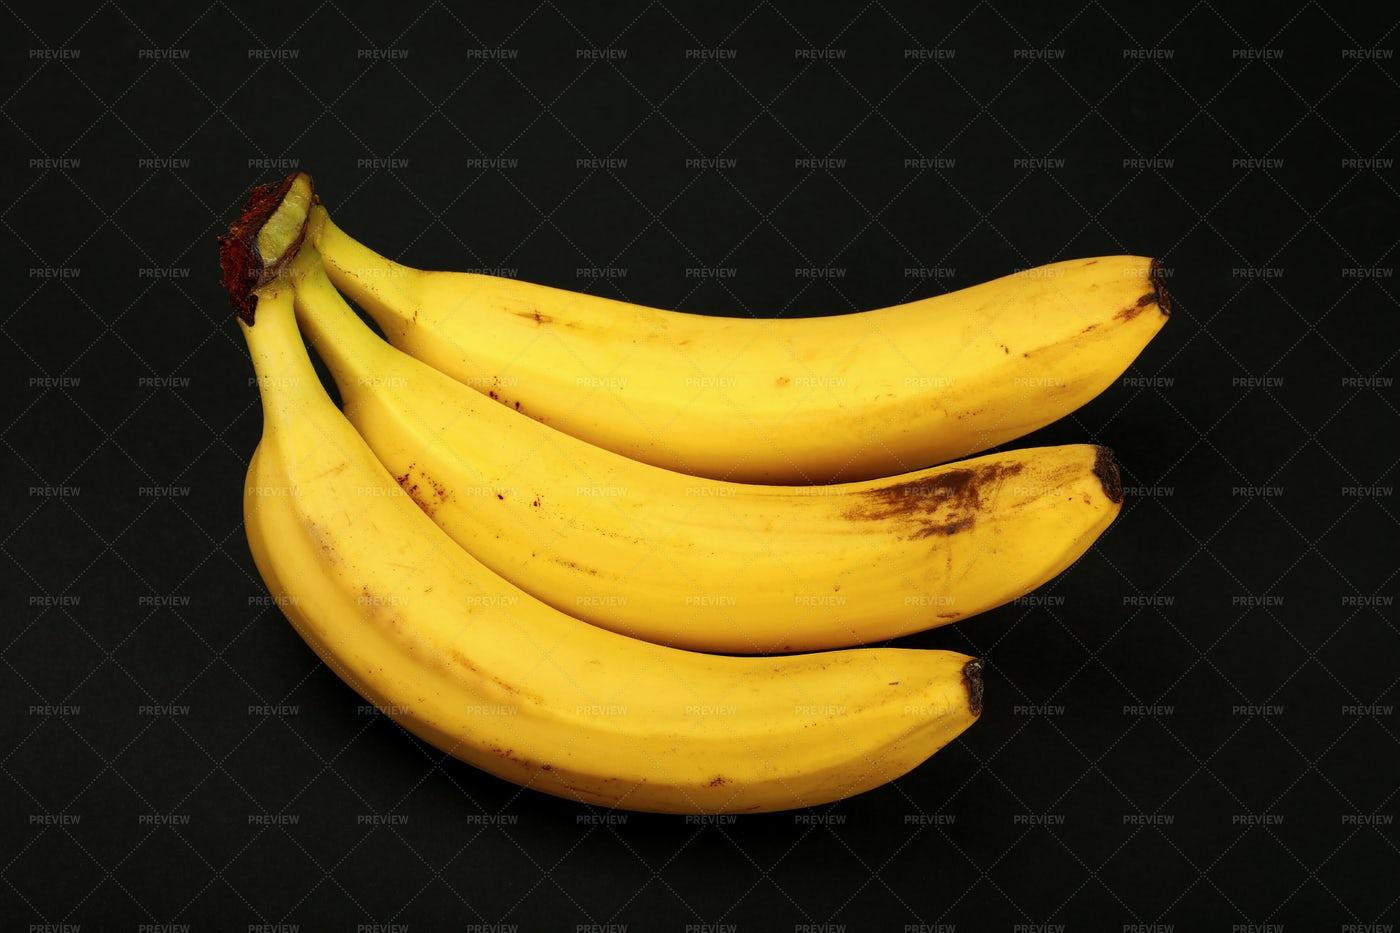 Bunch Of Bananas On Black: Stock Photos